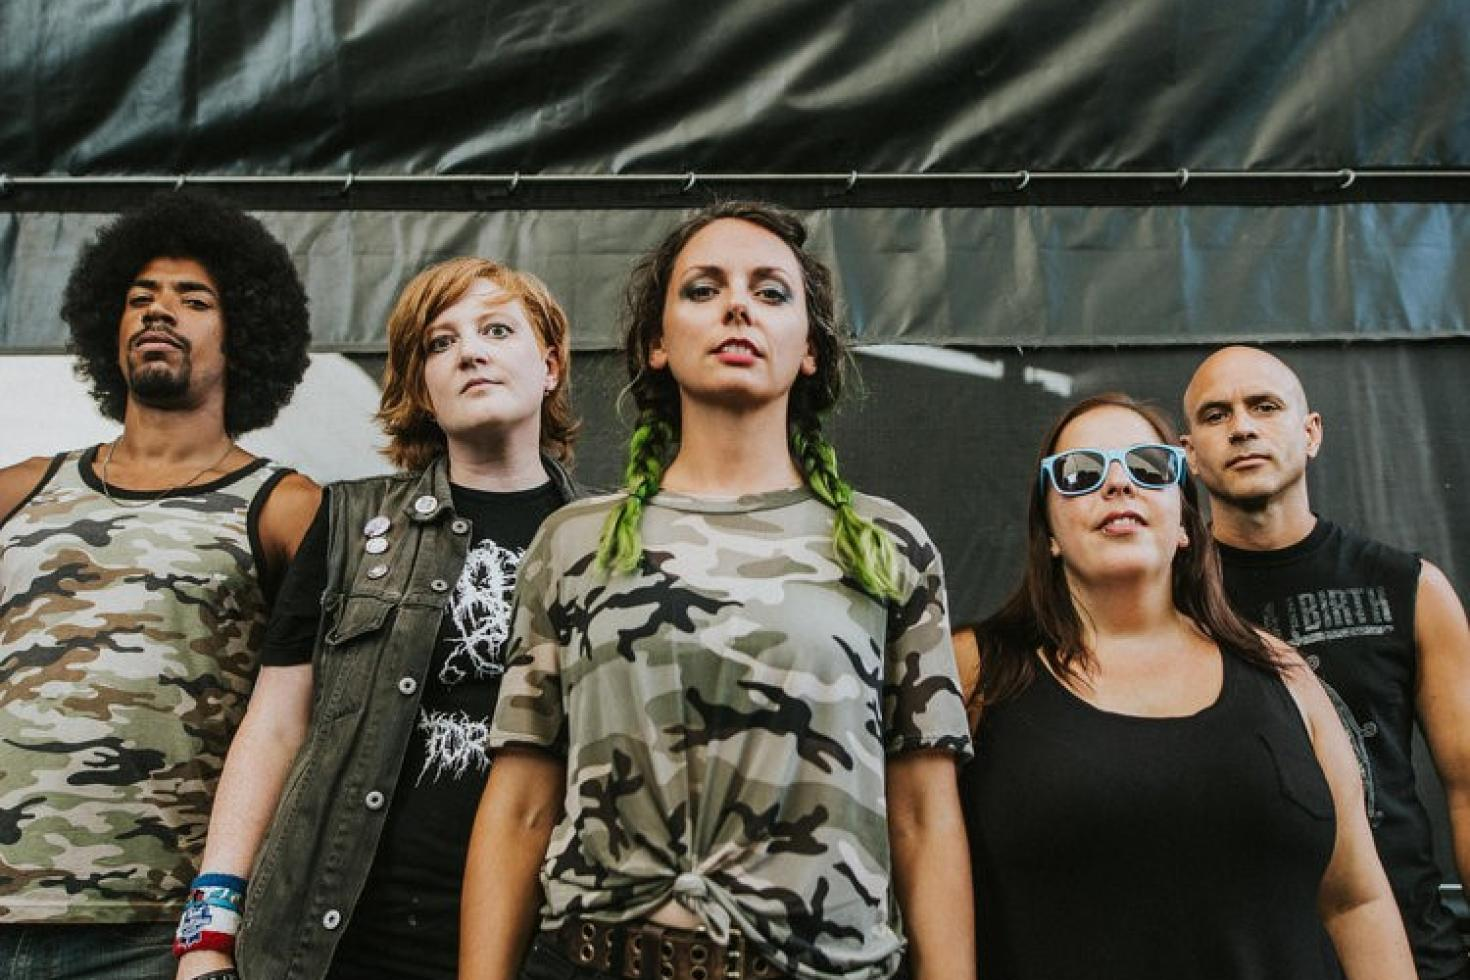 lone rock milf women 100% free lone rock milfs & meet milfs signup free & meet 1000s of sexy lone rock, iowa singles on bookofmatchescom.